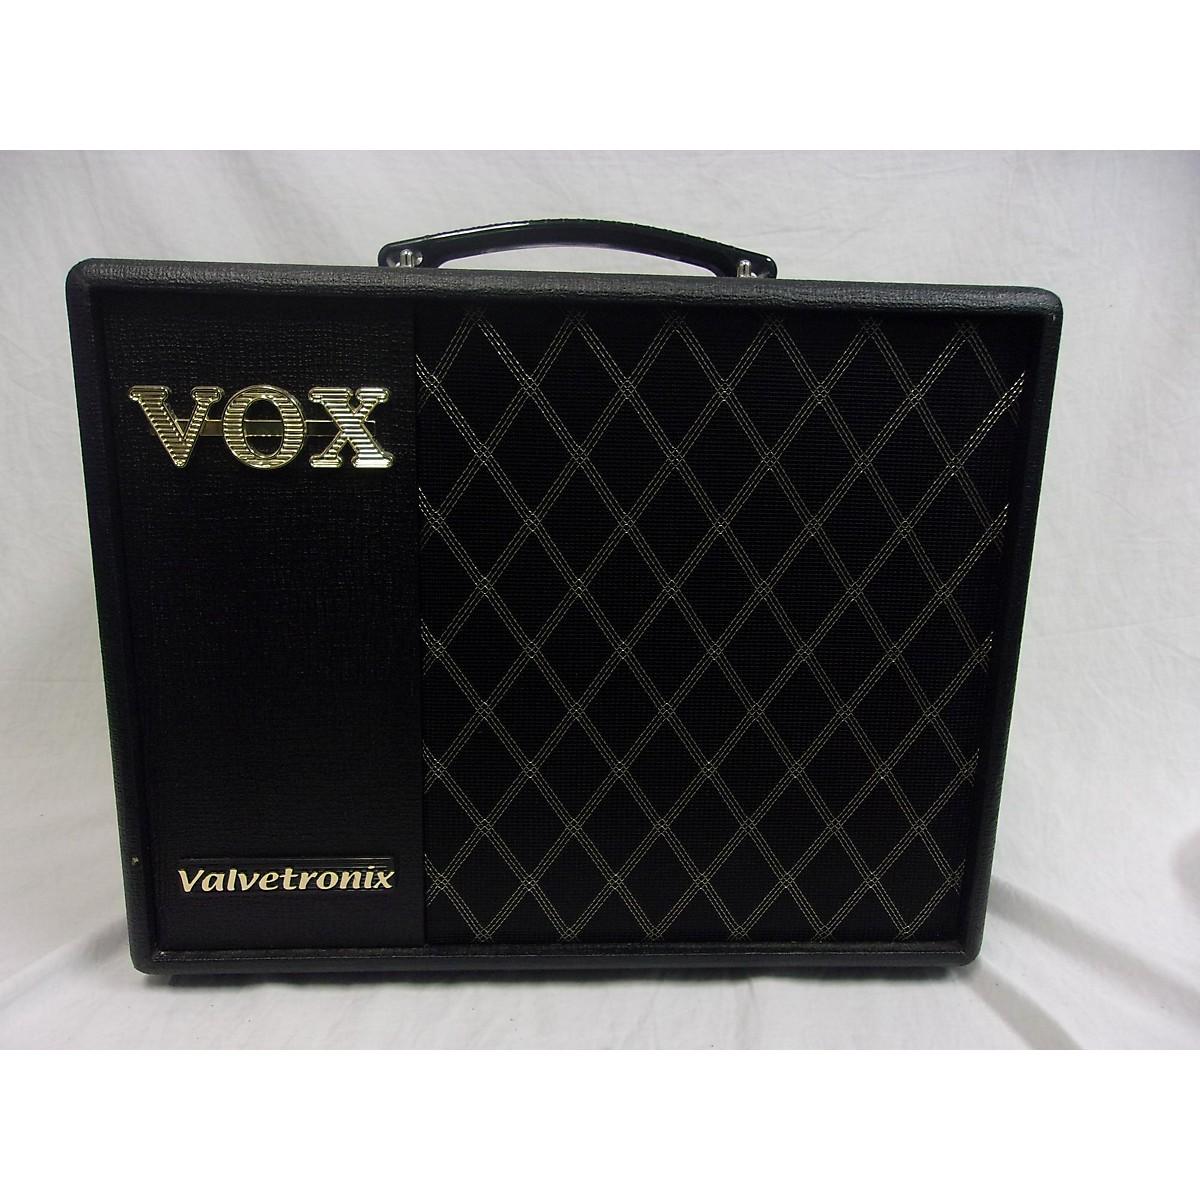 Vox Valvetronix VT20X 20W 1x8 Guitar Combo Amp